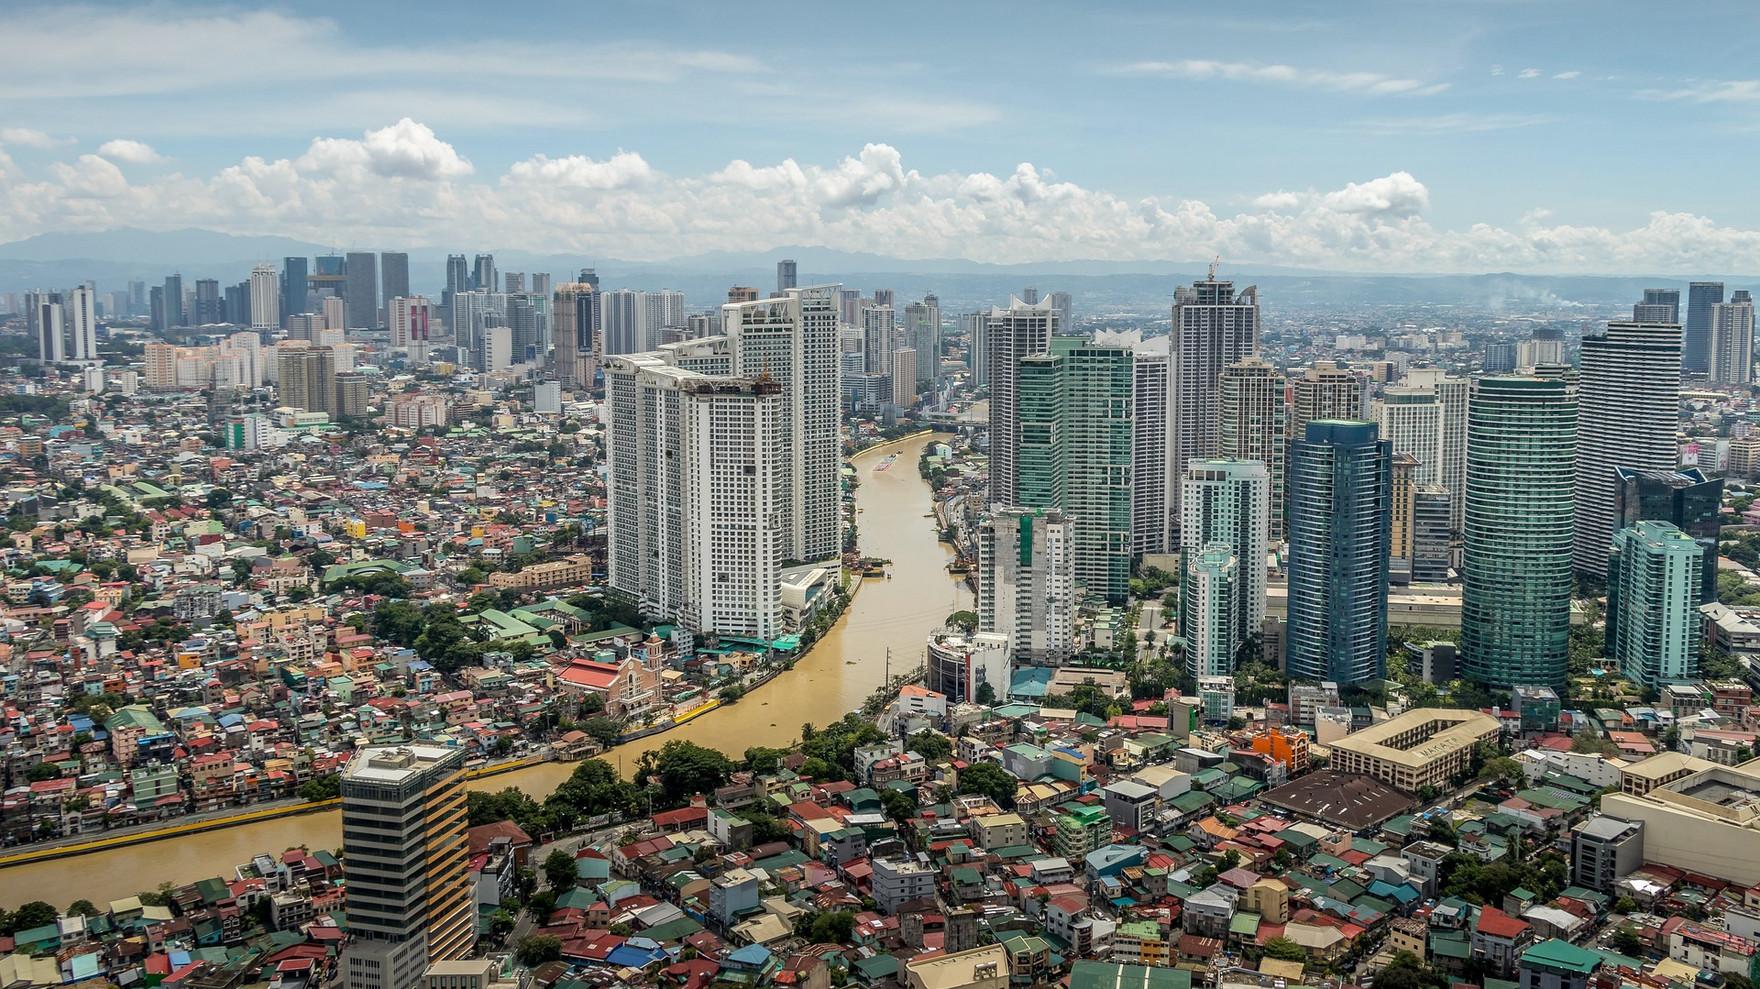 Pasig River, Metro Manila, Philippines